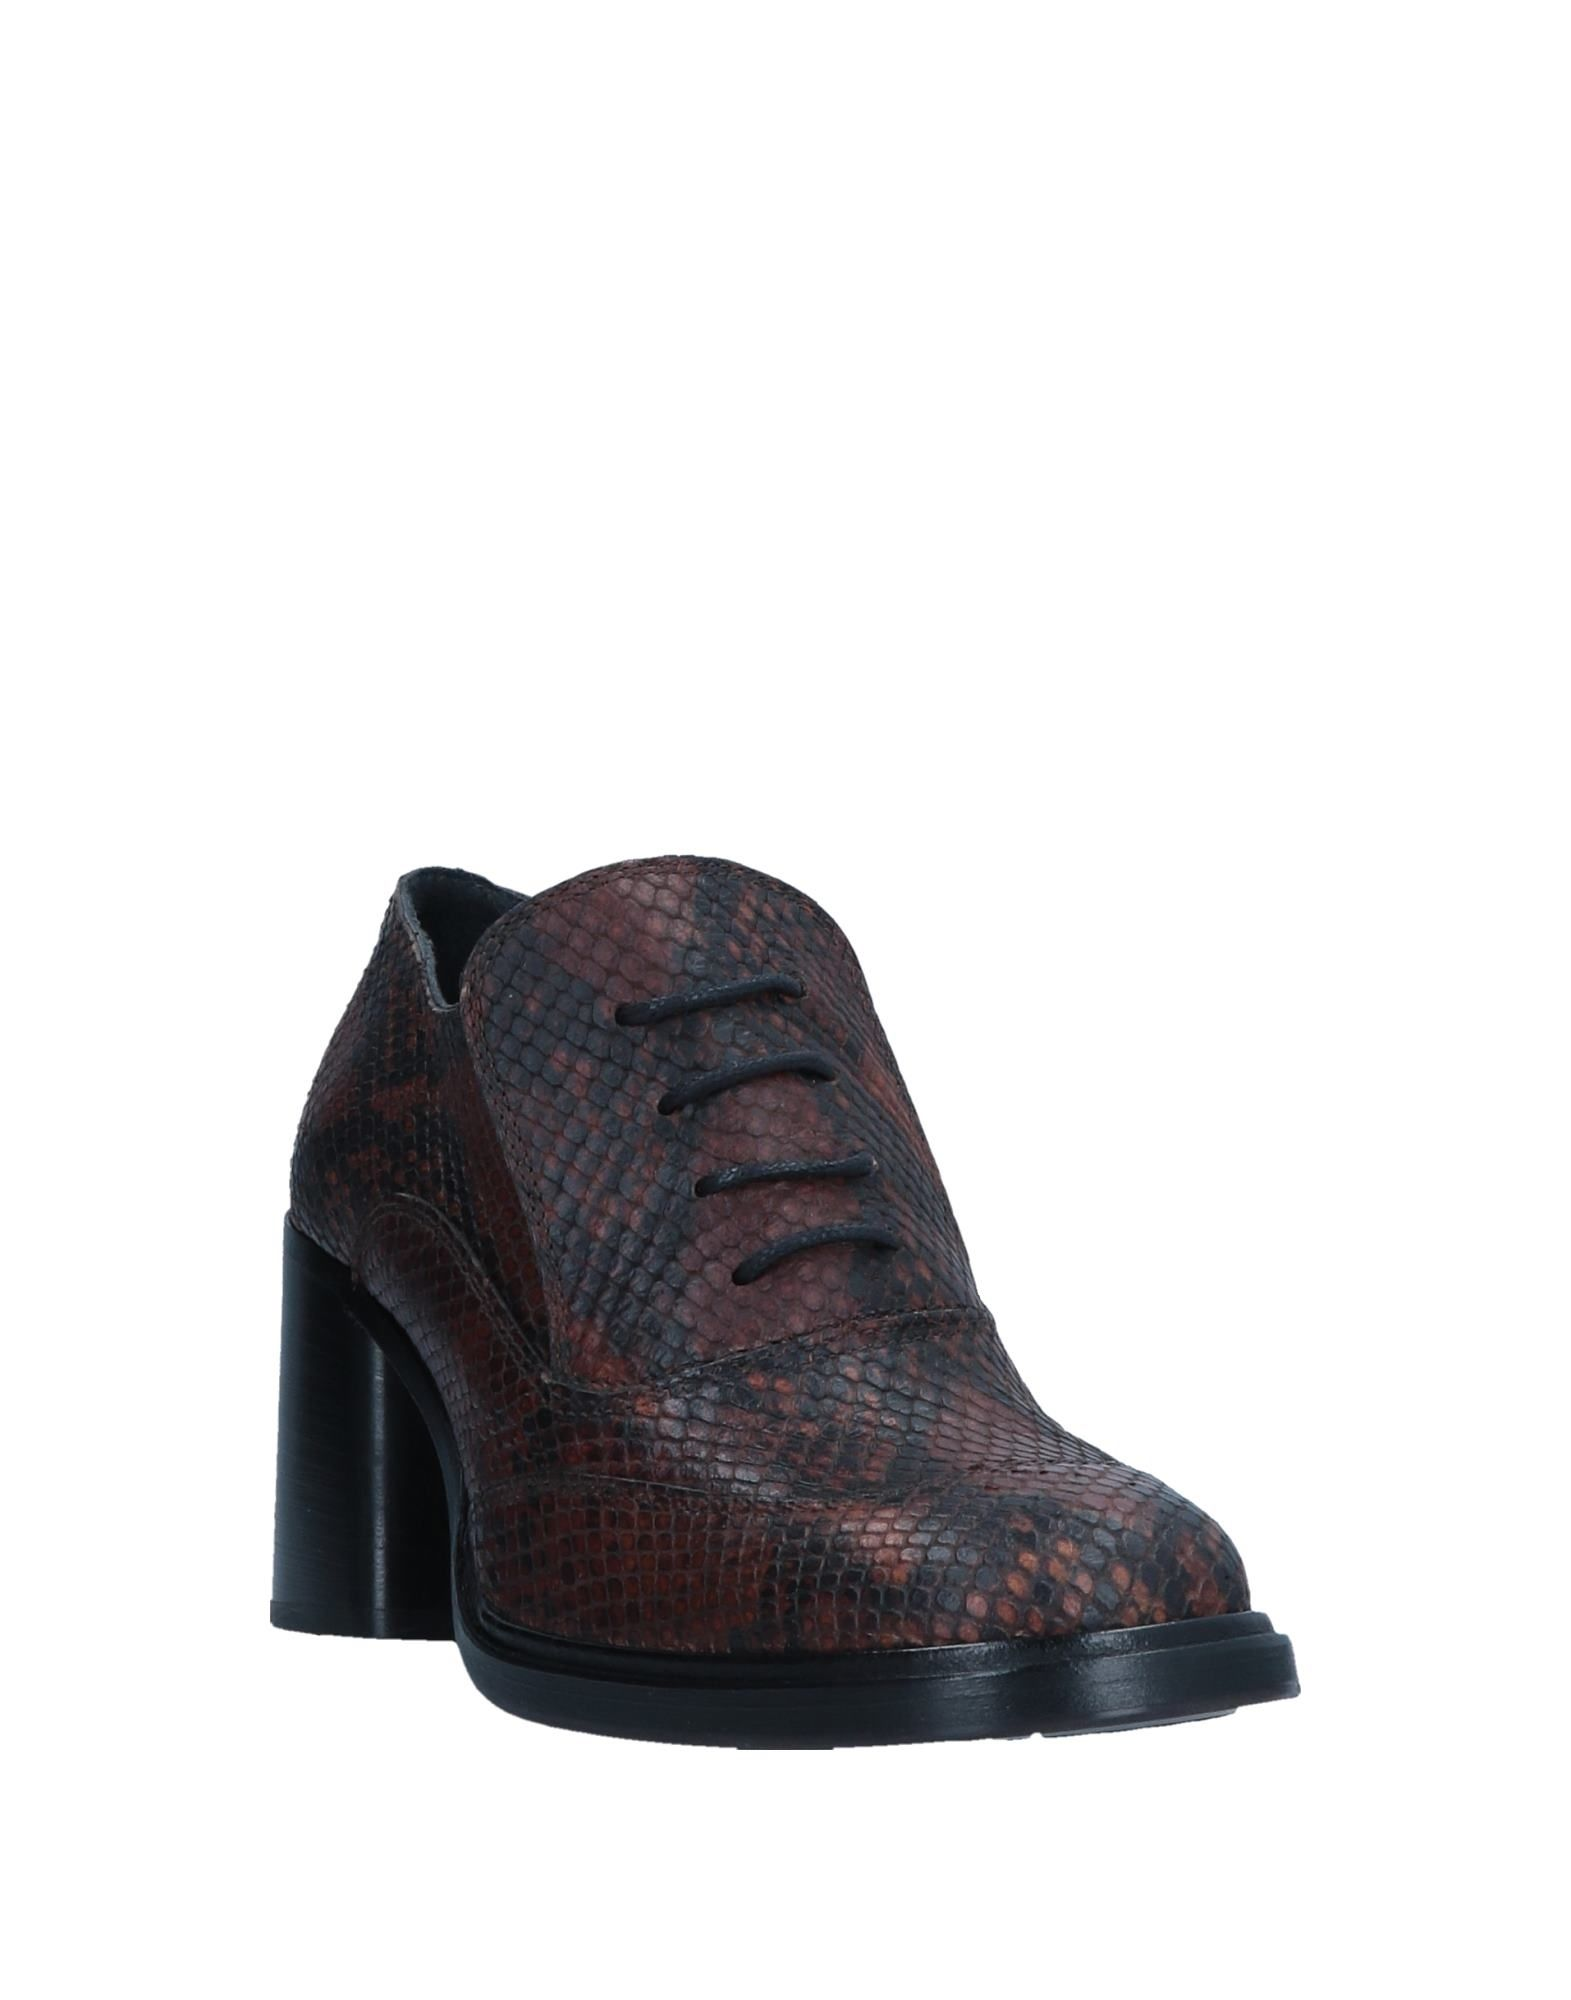 Stilvolle billige  Schuhe Buttero® Schnürschuhe Damen  billige 11553403VK 7e3ba8